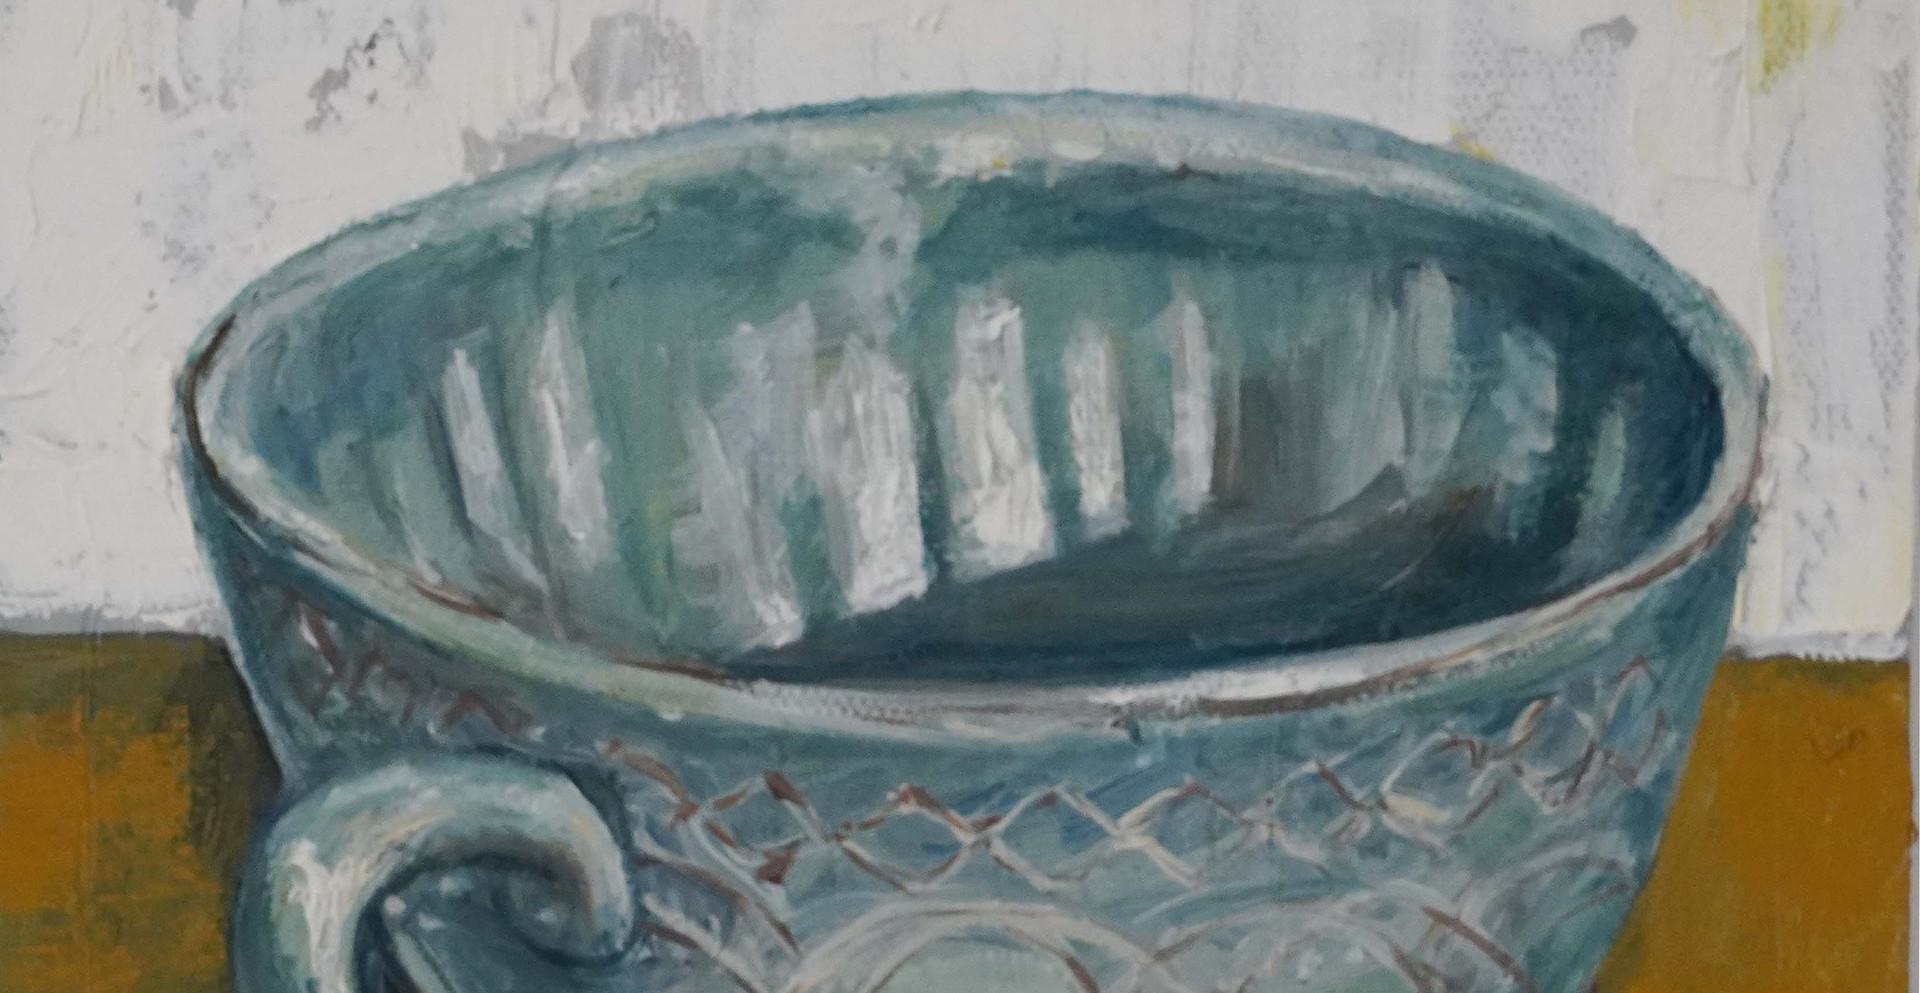 Study cappucino cup